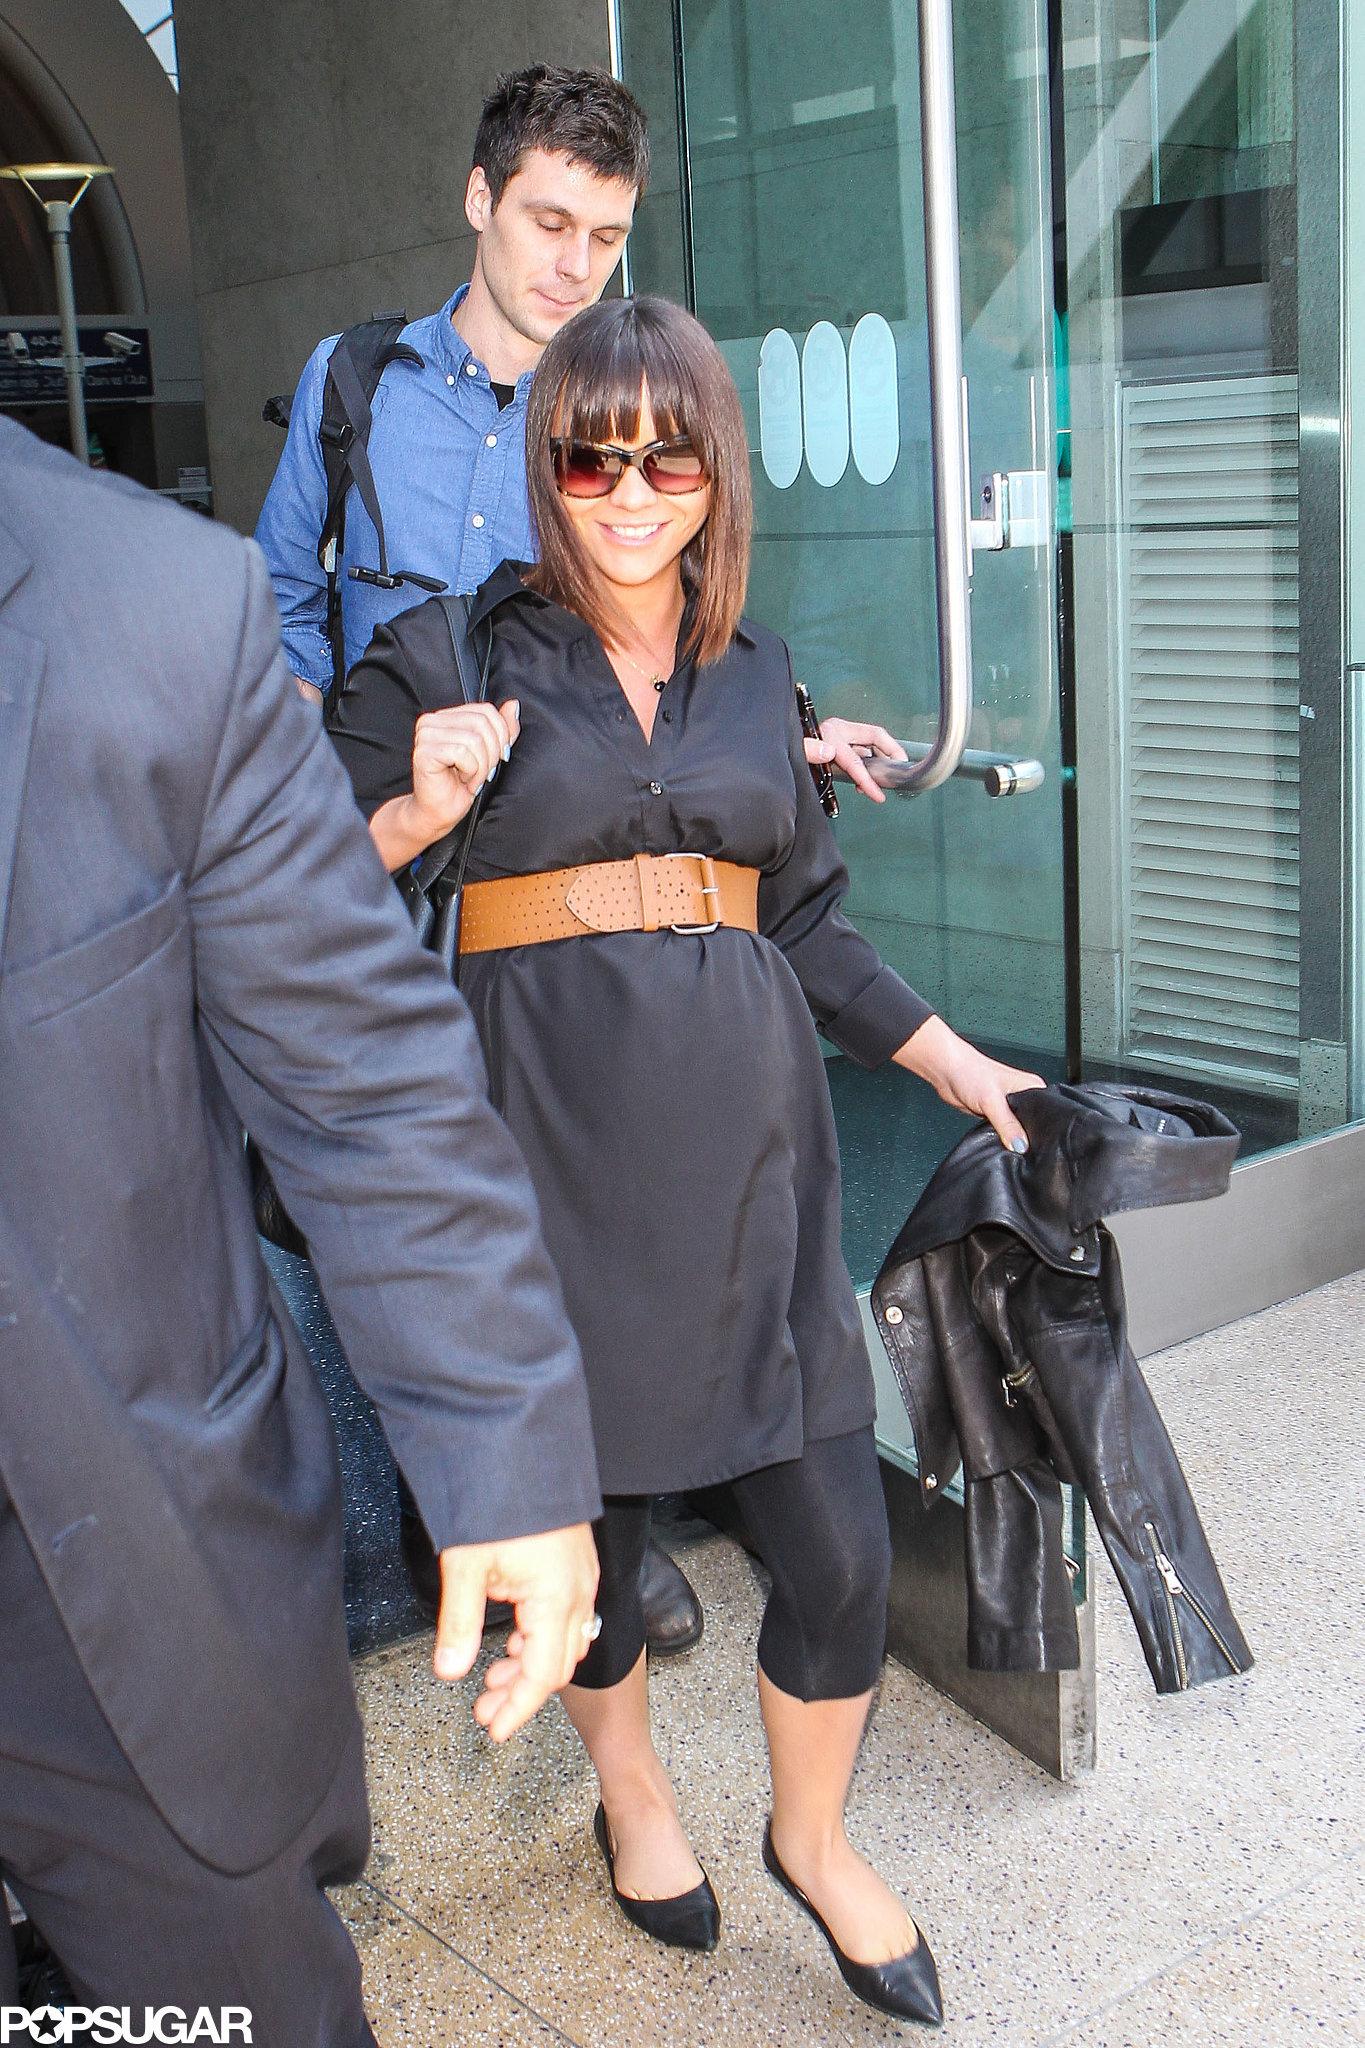 Christina Ricci Returns to LA and Puts Her Baby Bump on Display